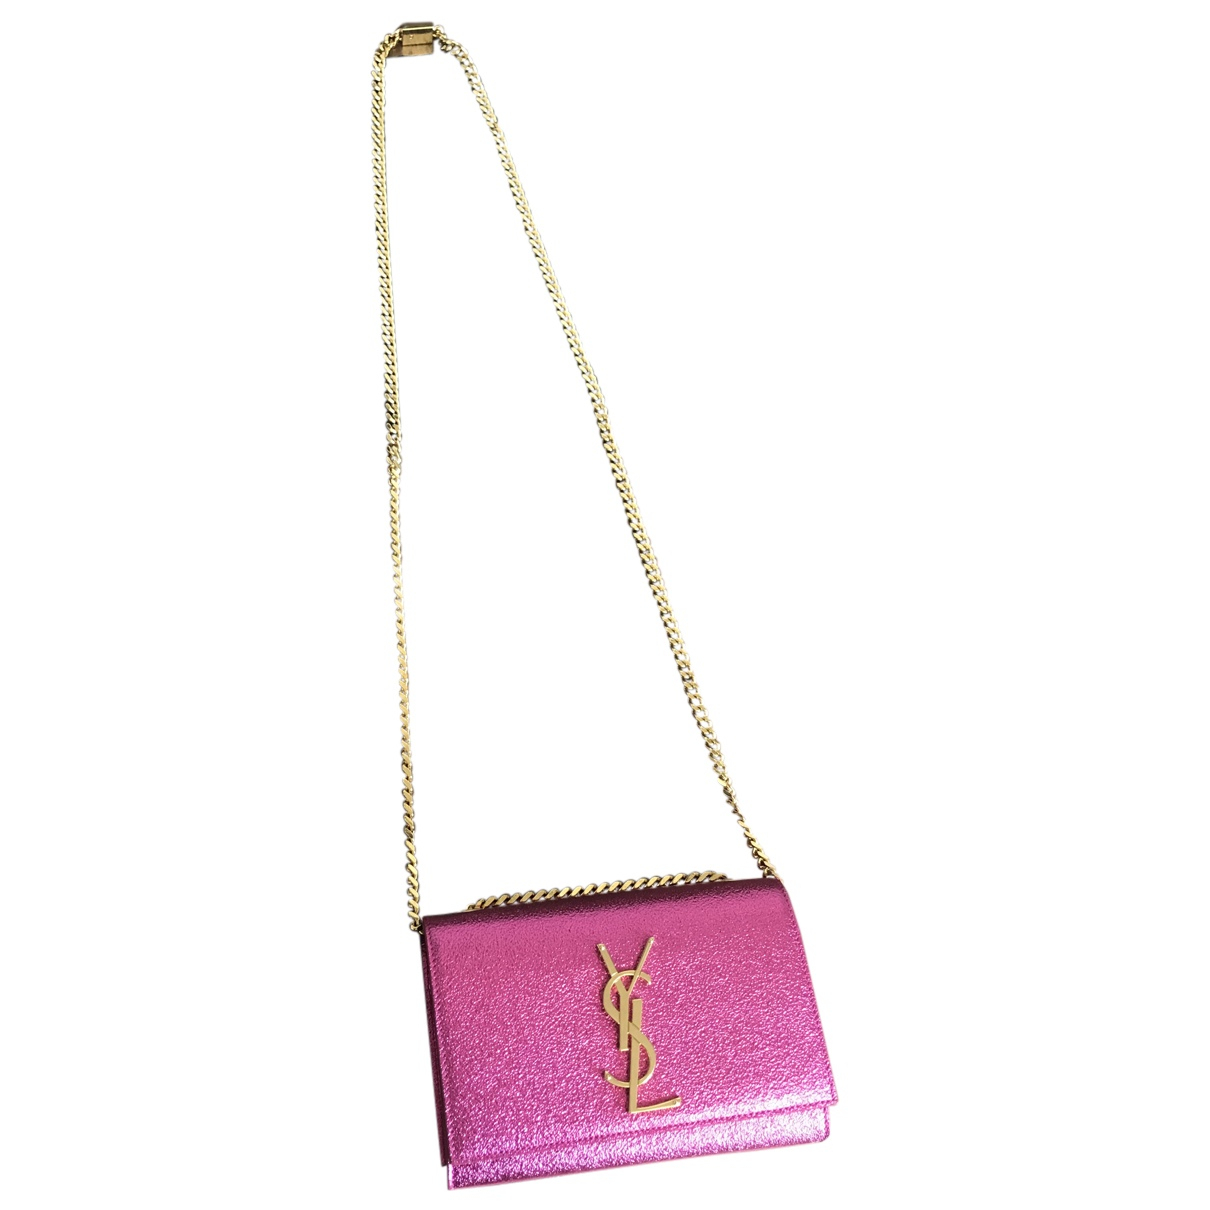 Yves Saint Laurent N Pink Leather handbag for Women N